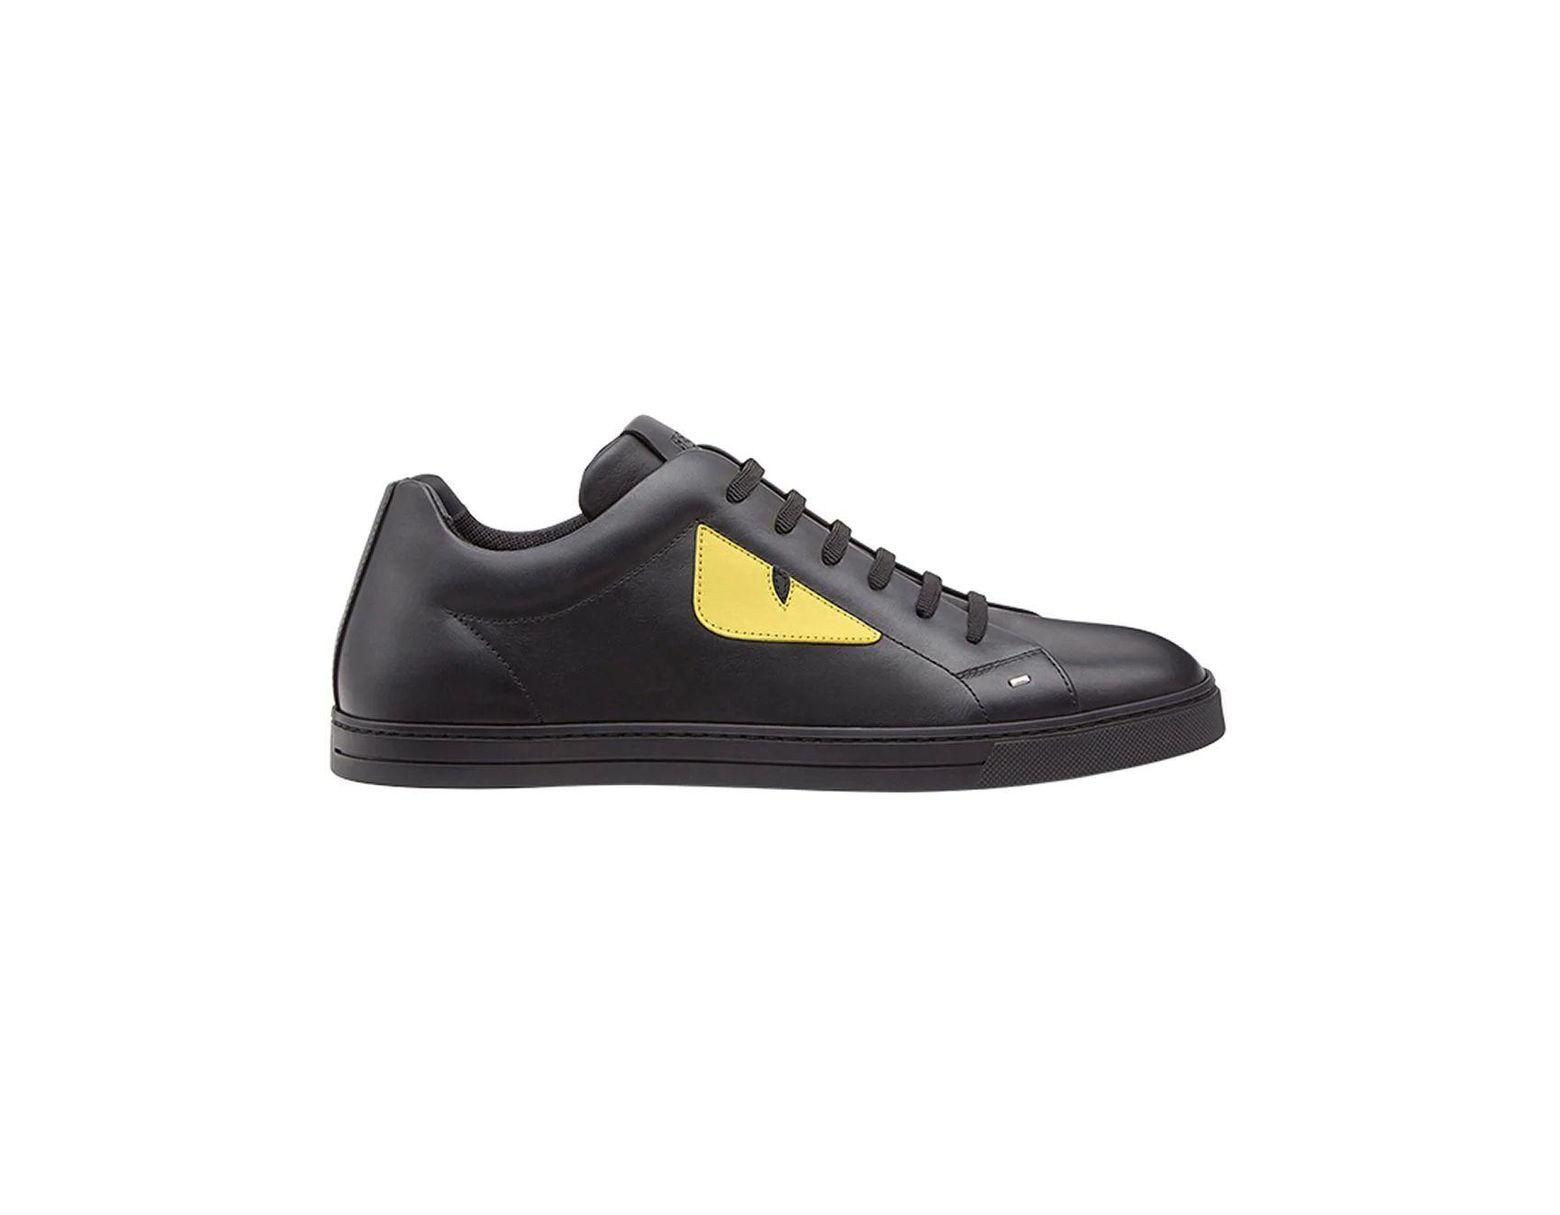 f80c124889 Fendi - Black Leather Sneakers for Men - Lyst